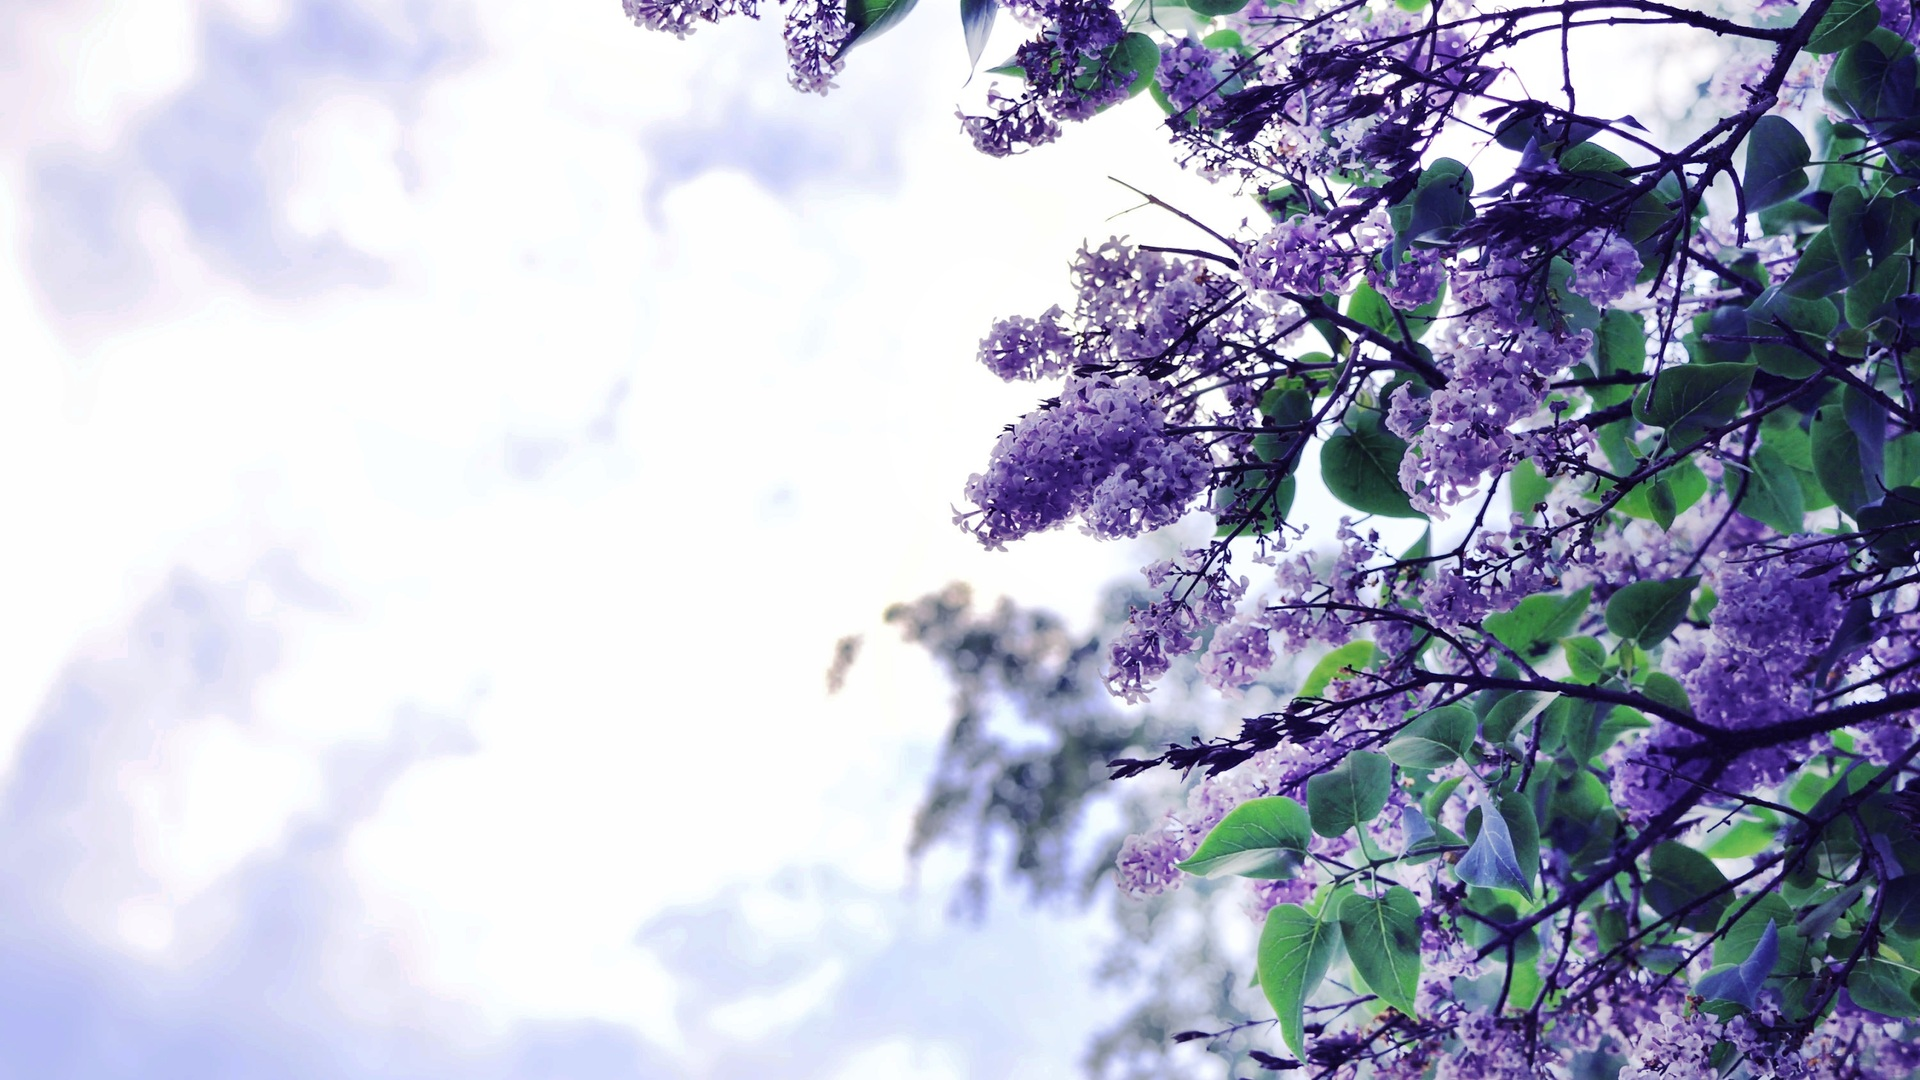 lilac-flowers-tree-mo.jpg